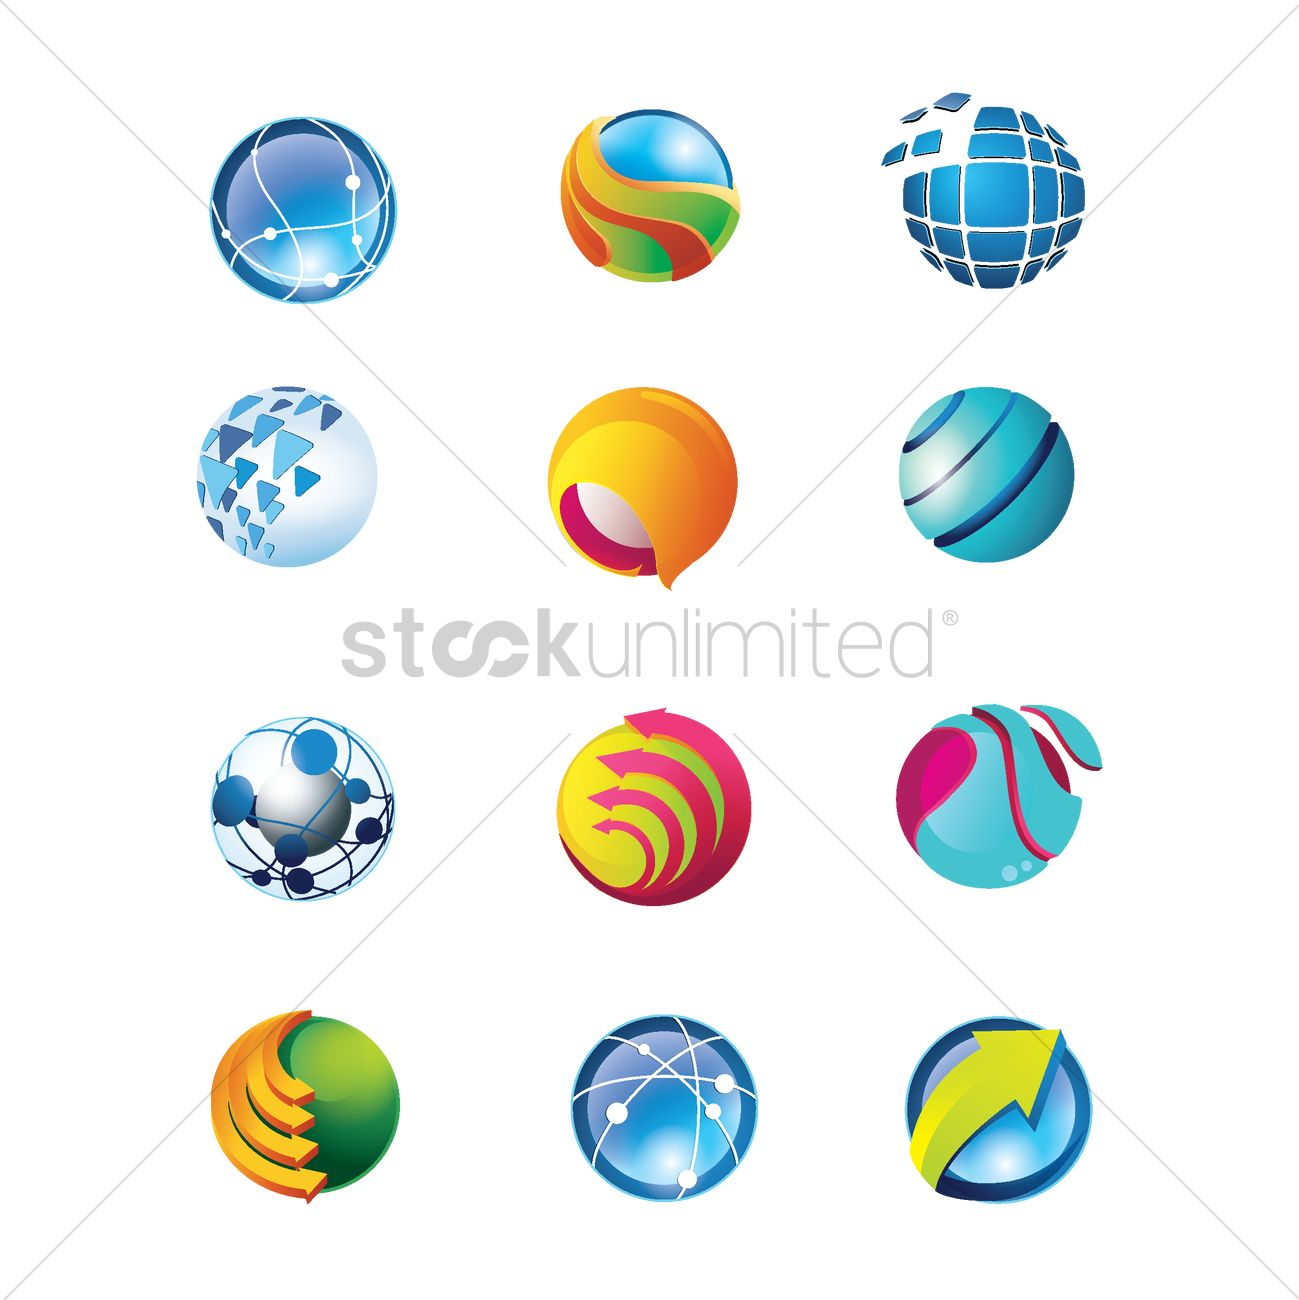 Spherical logo element design collection Vector Image.